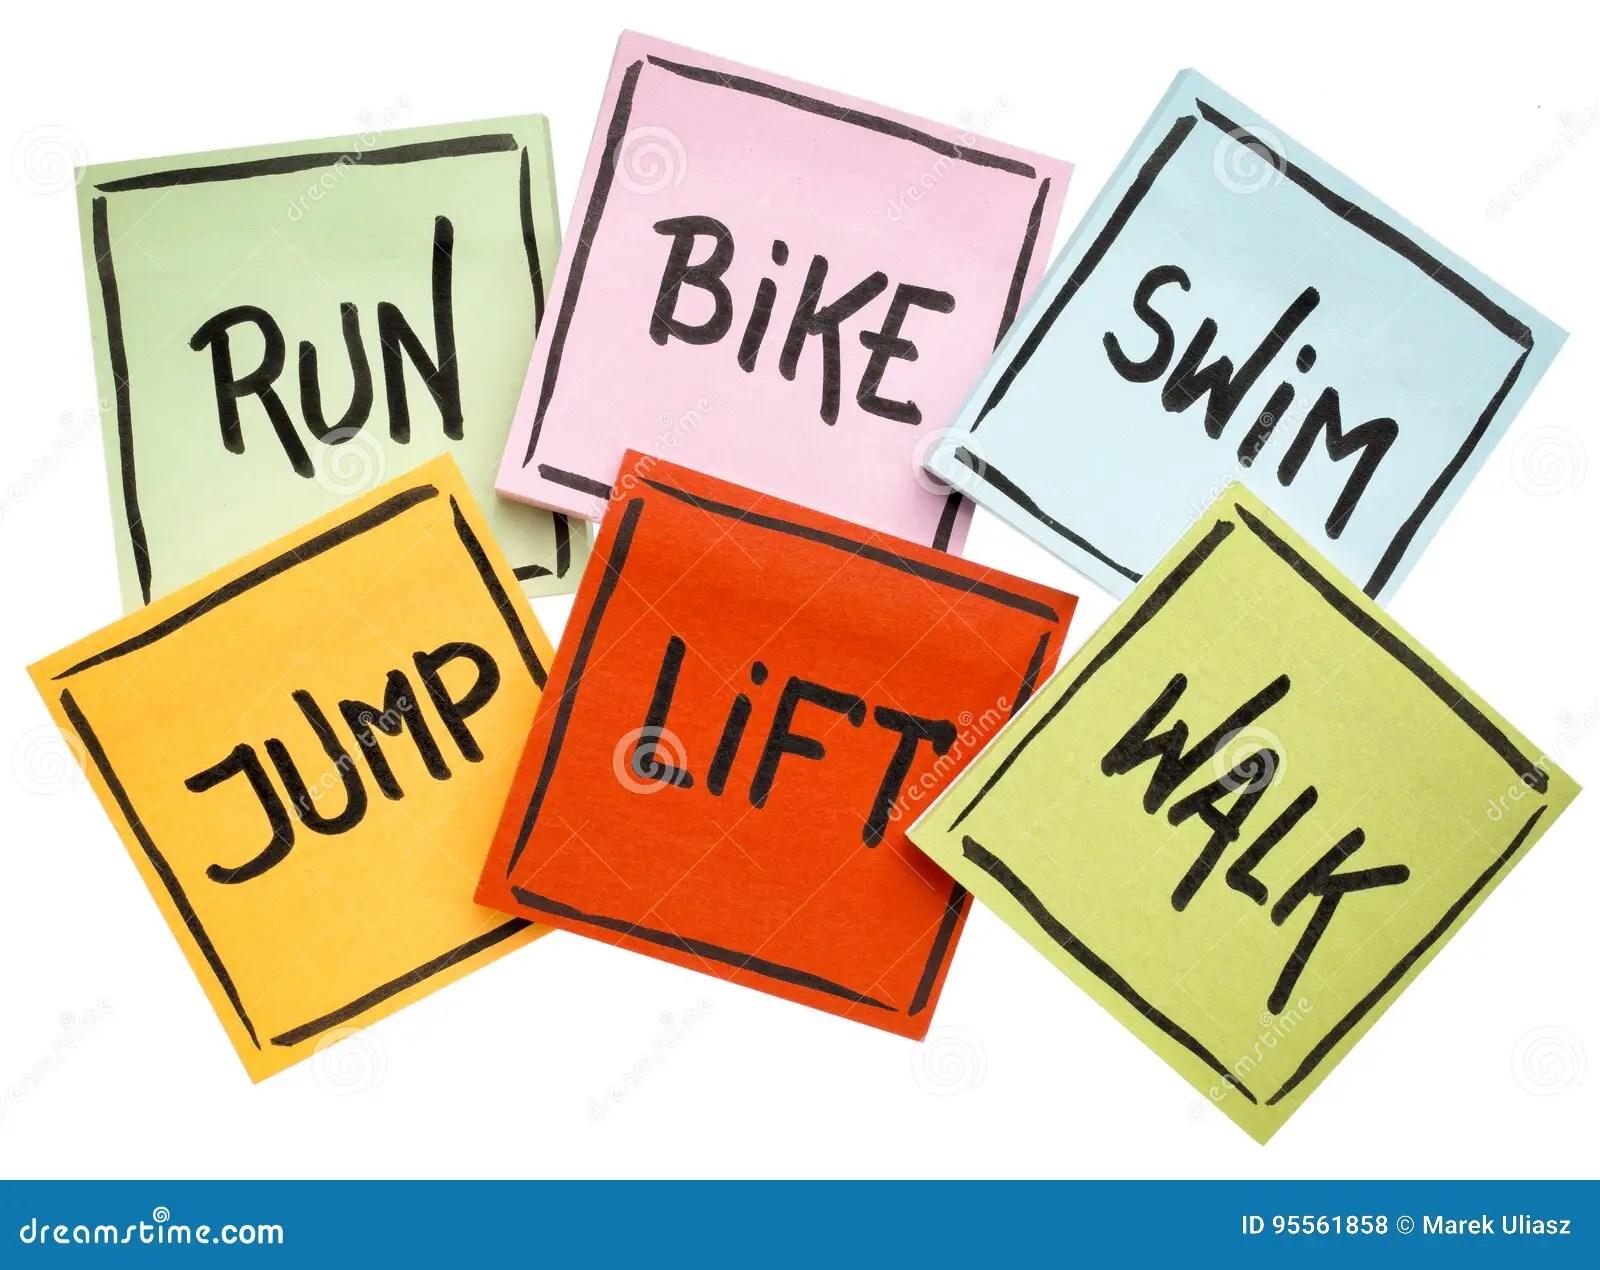 Run Bike Swim Jump Lift Walk